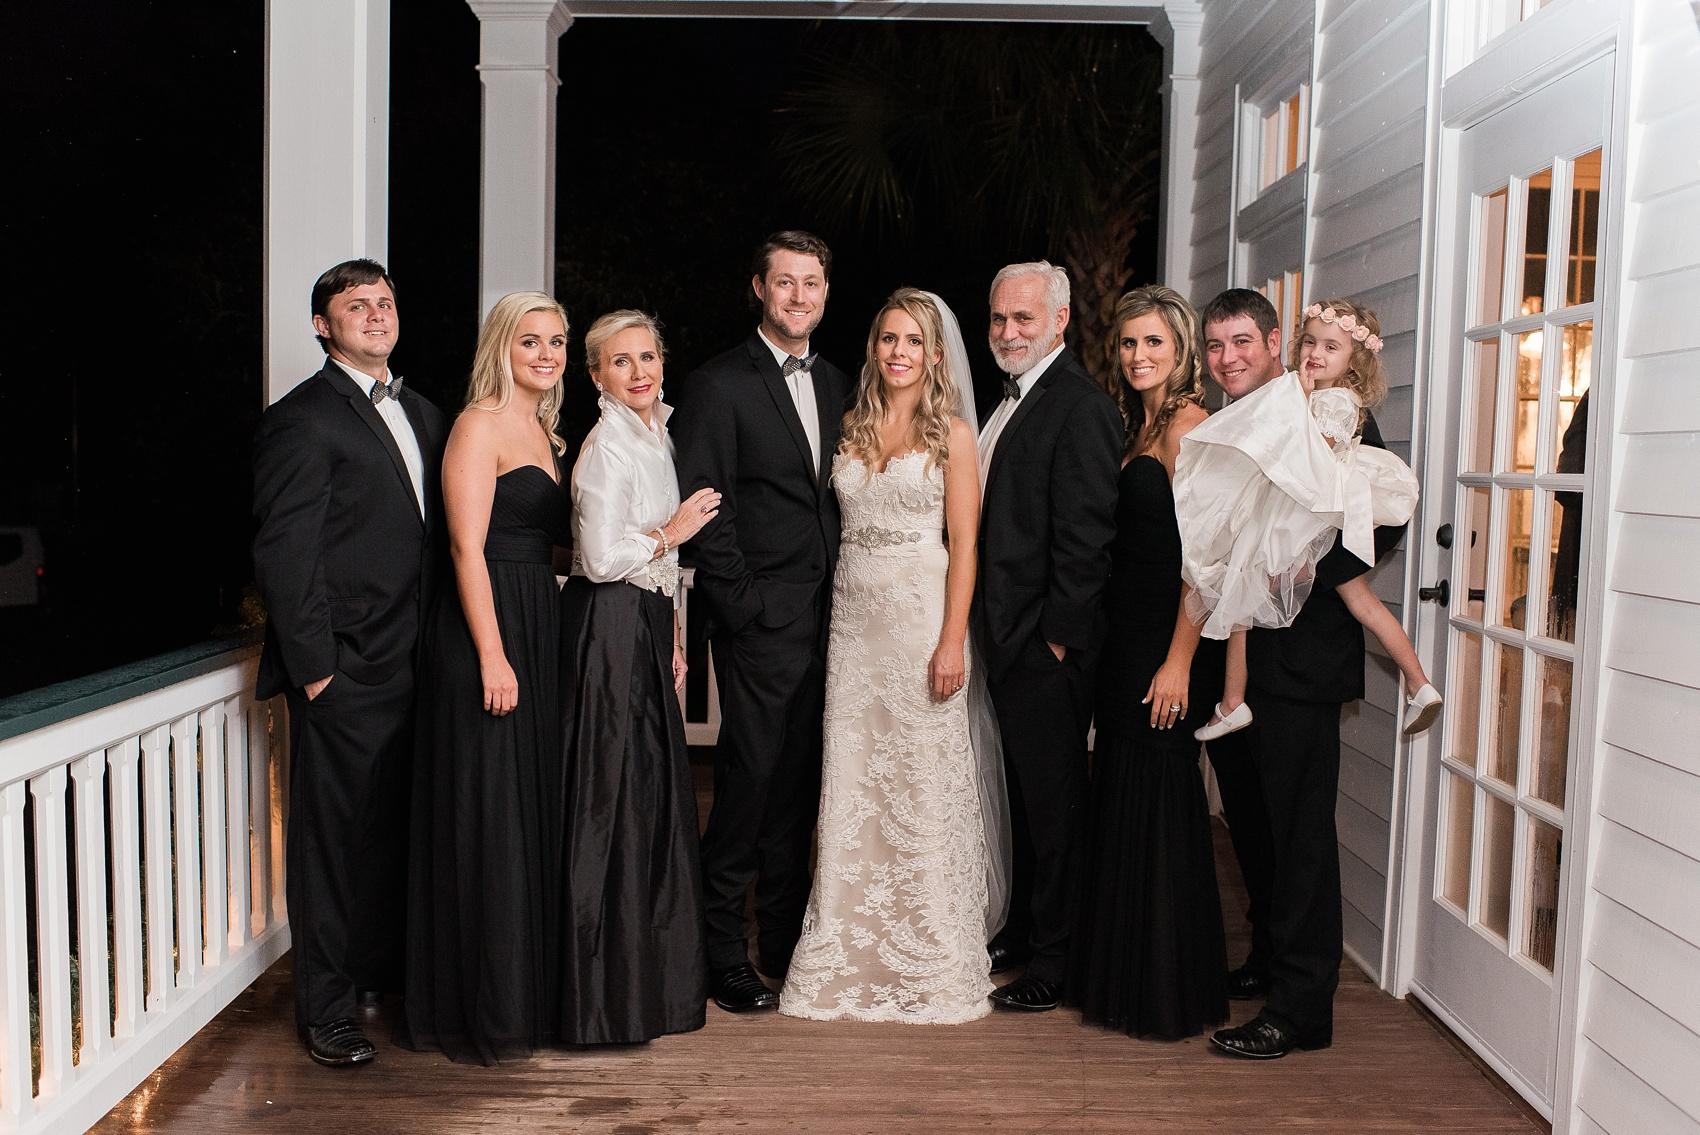 South_carolina_wedding_photographer_0068.jpg